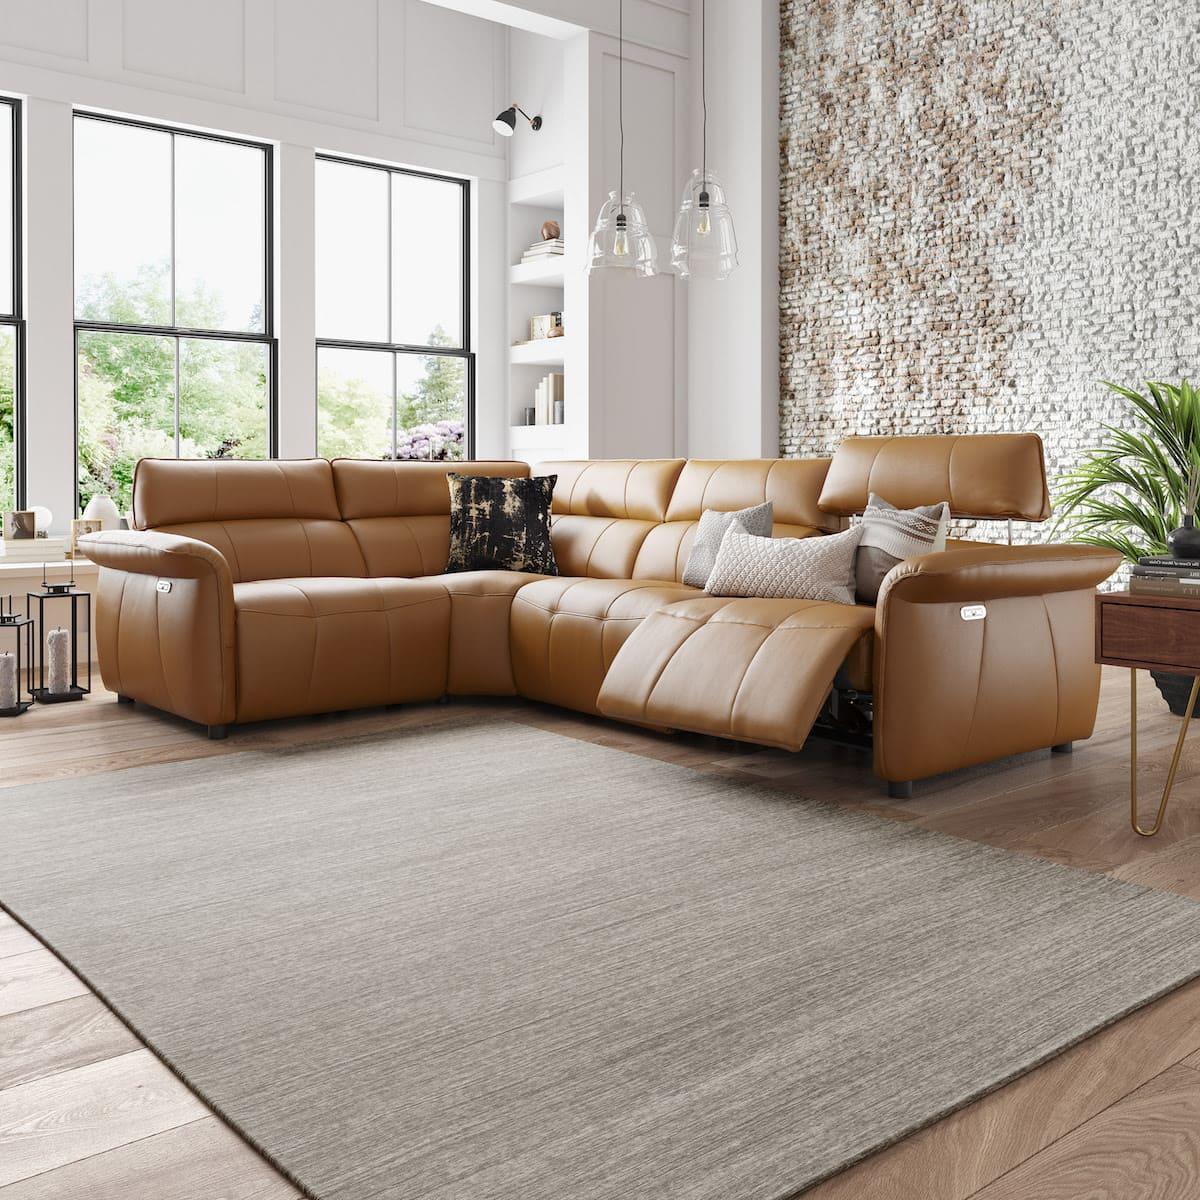 дизайн интерьера модной квартиры фото 17